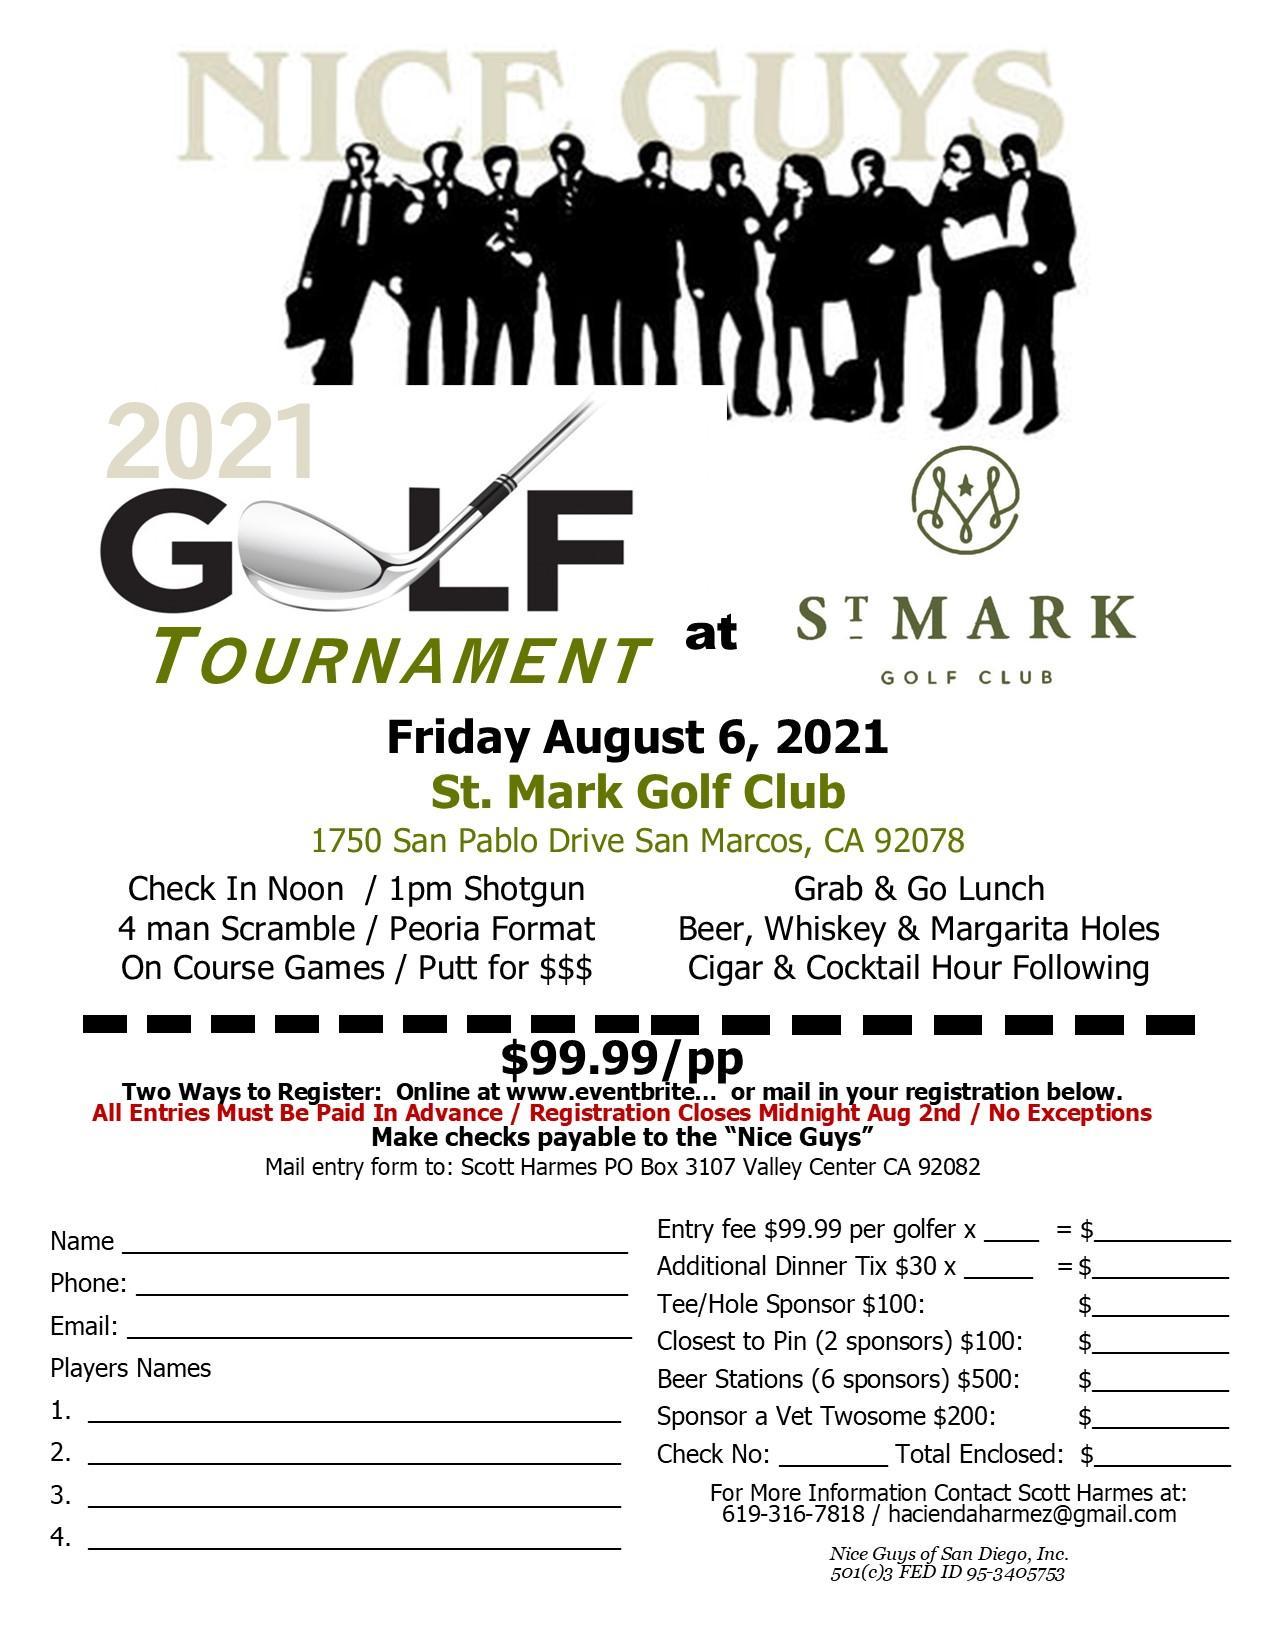 Nice Guys Golf Tournament 2021